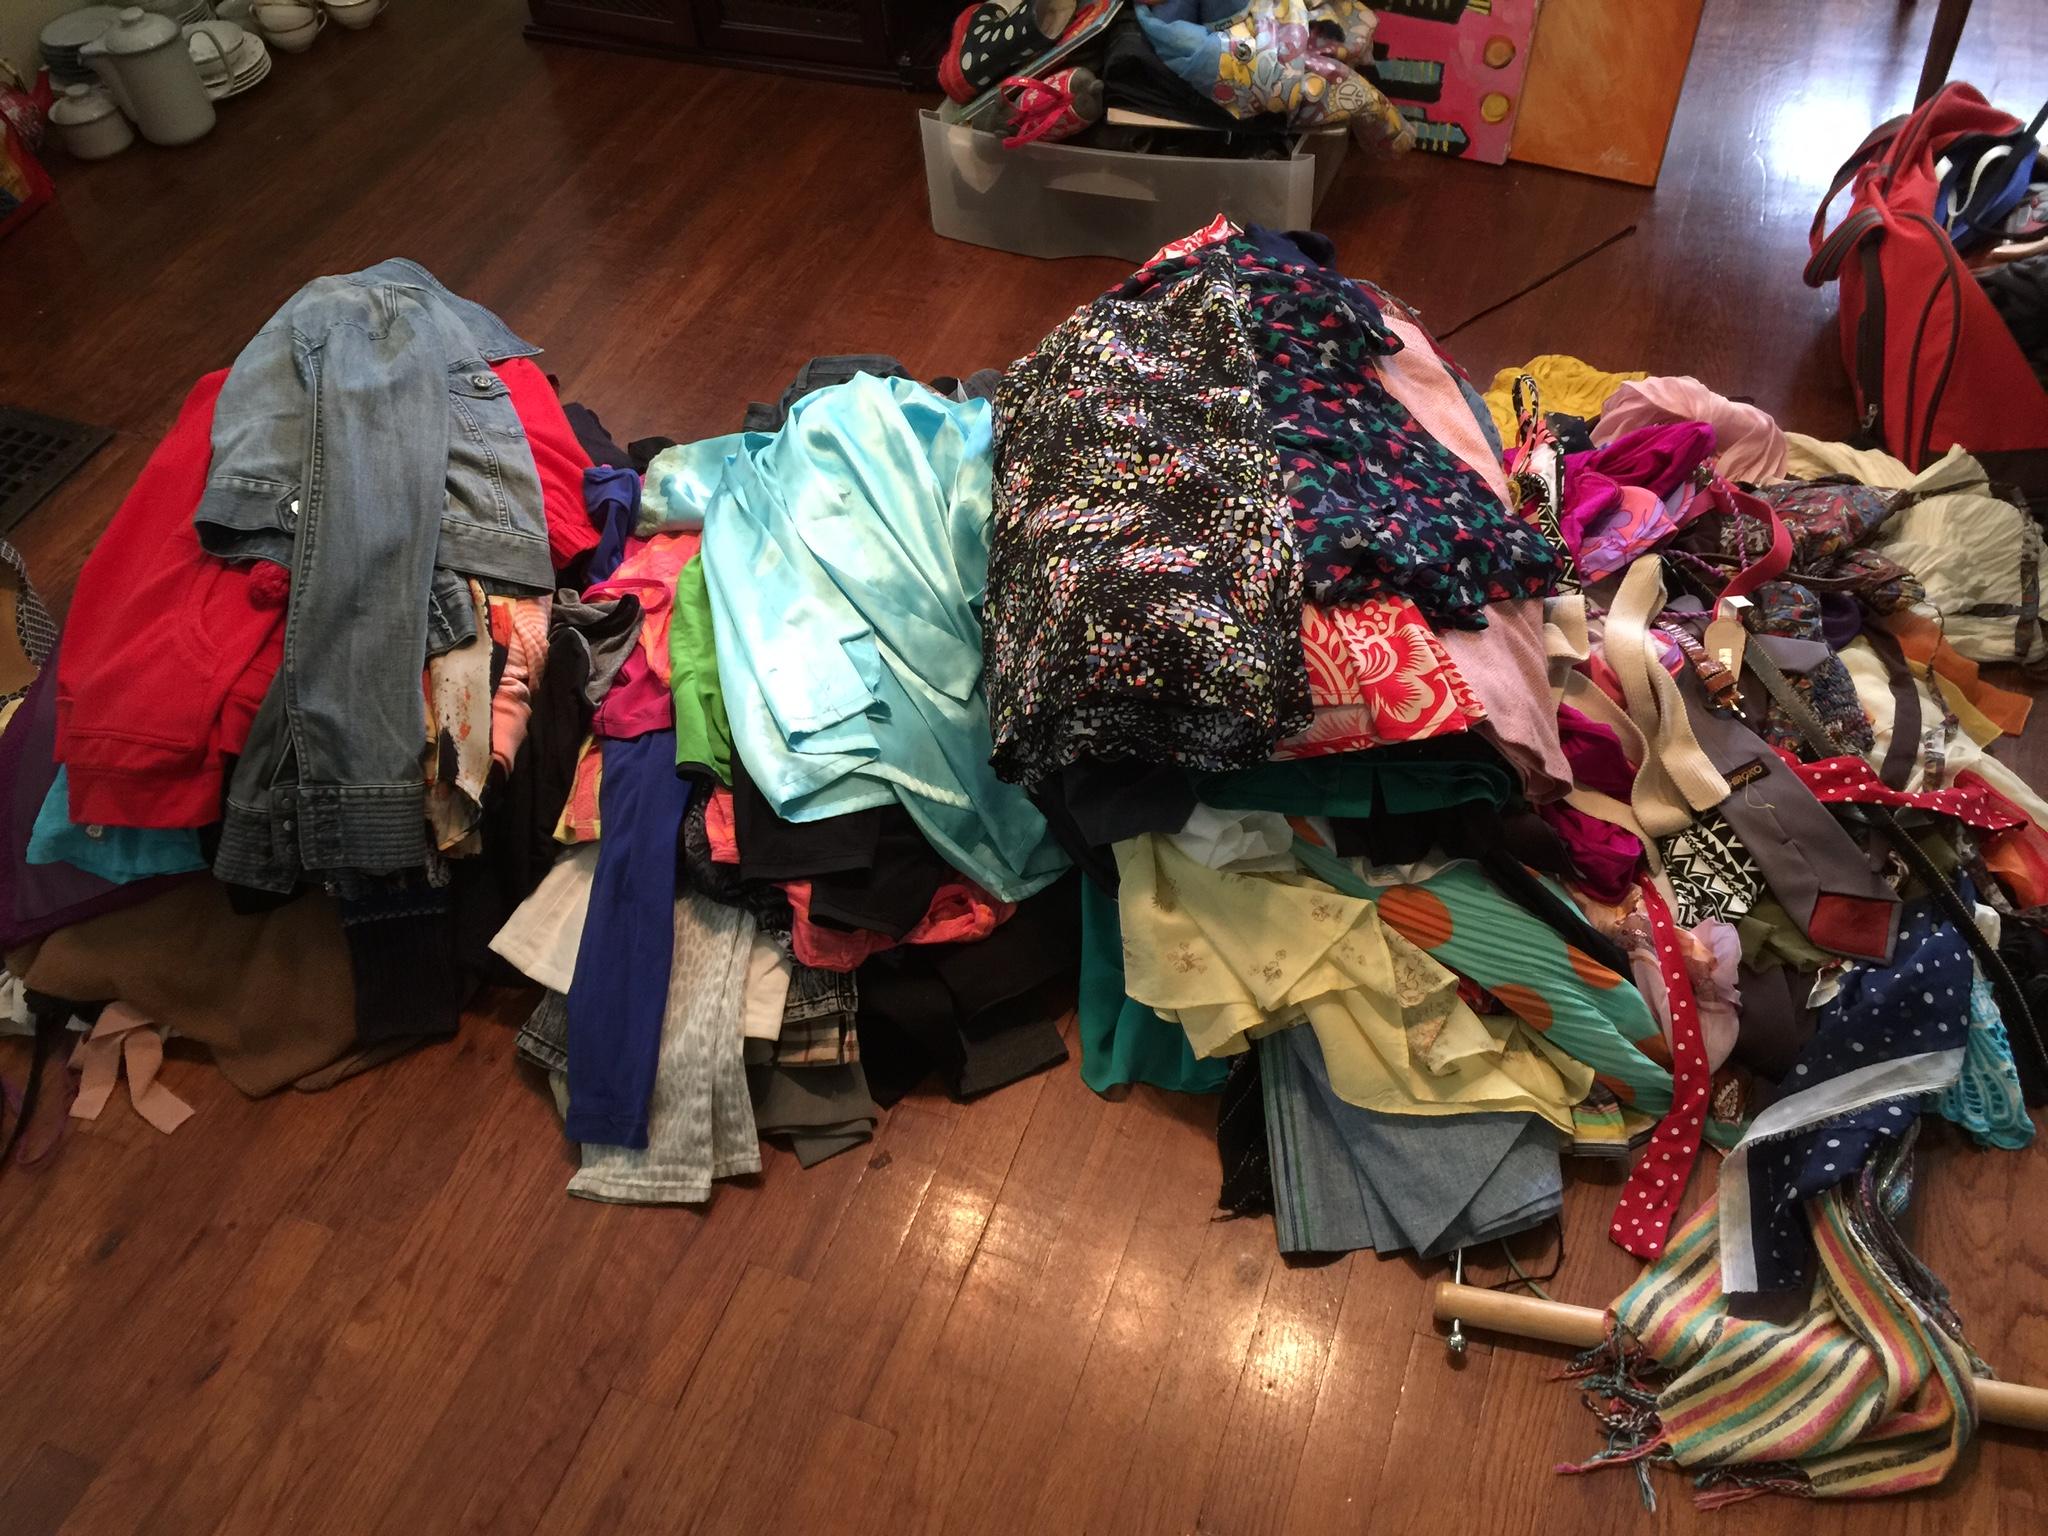 10 Secrets to Declutter Effectively Using the KonMari Method